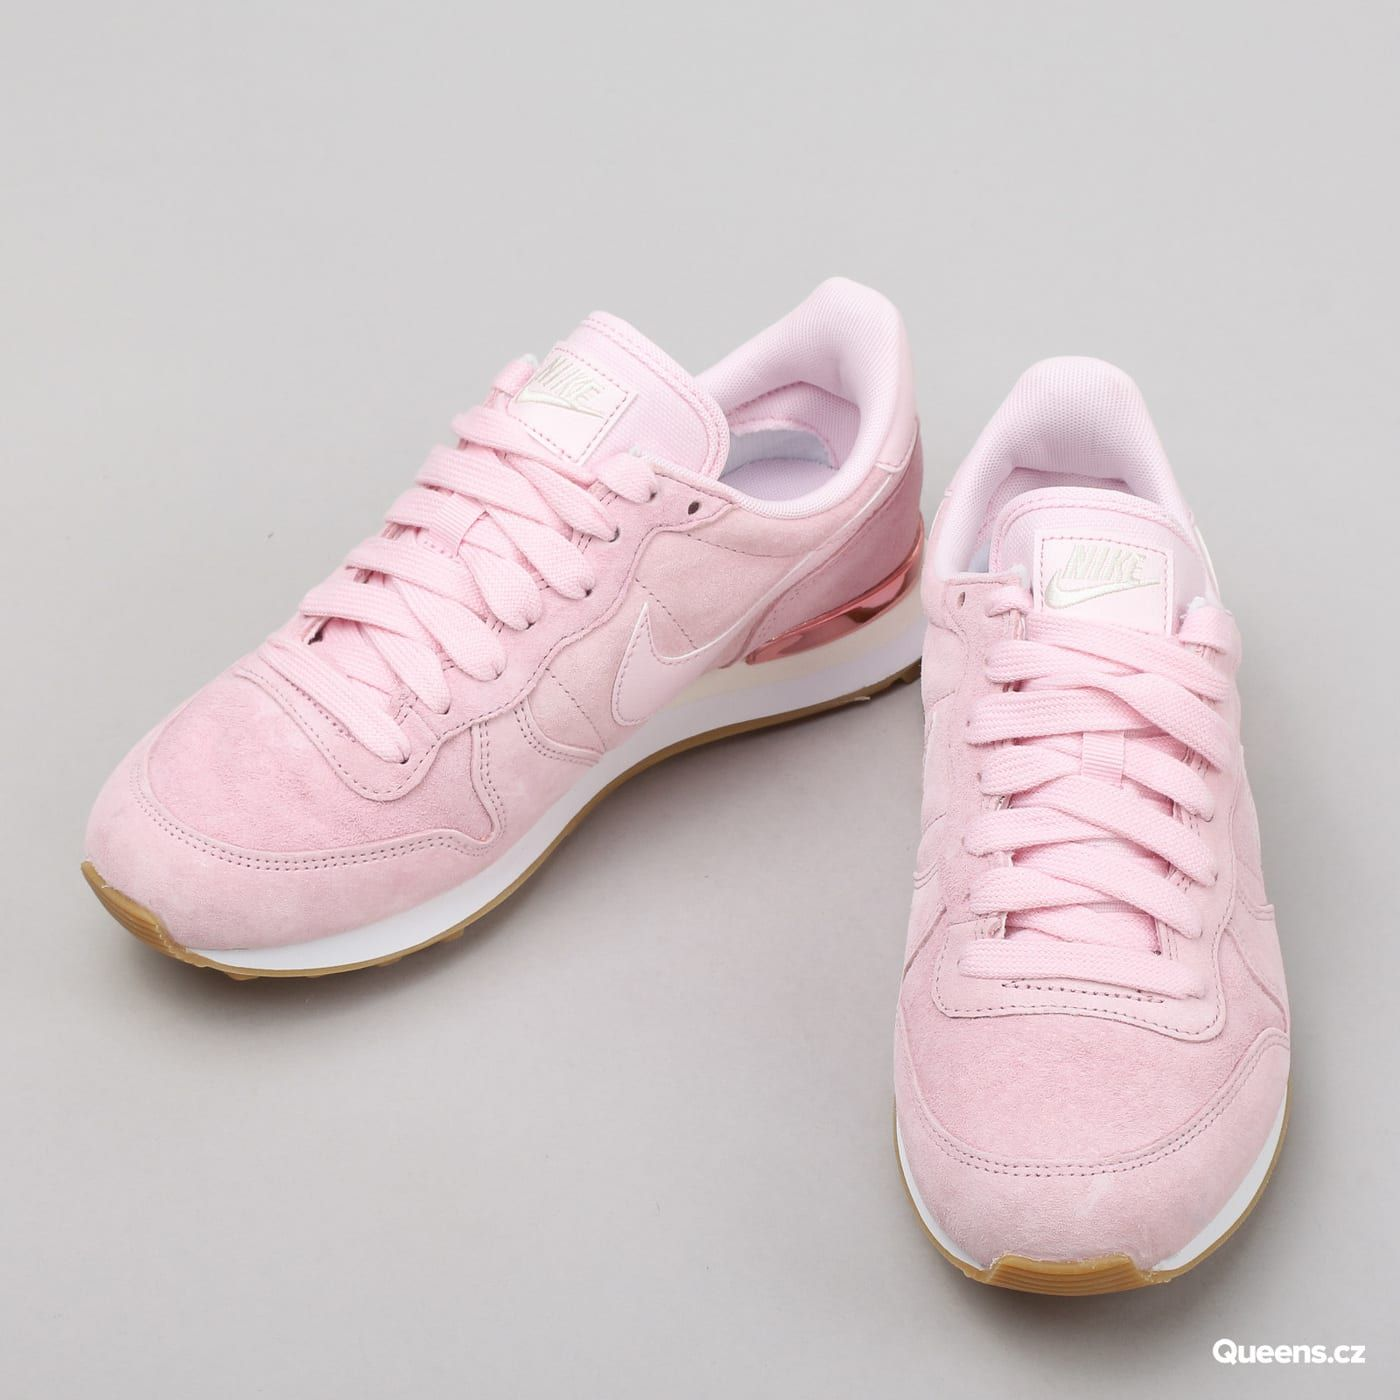 Nike W Internationalist SD prism pink   prism pink - white za 2 130 ... 4e39f1db74e